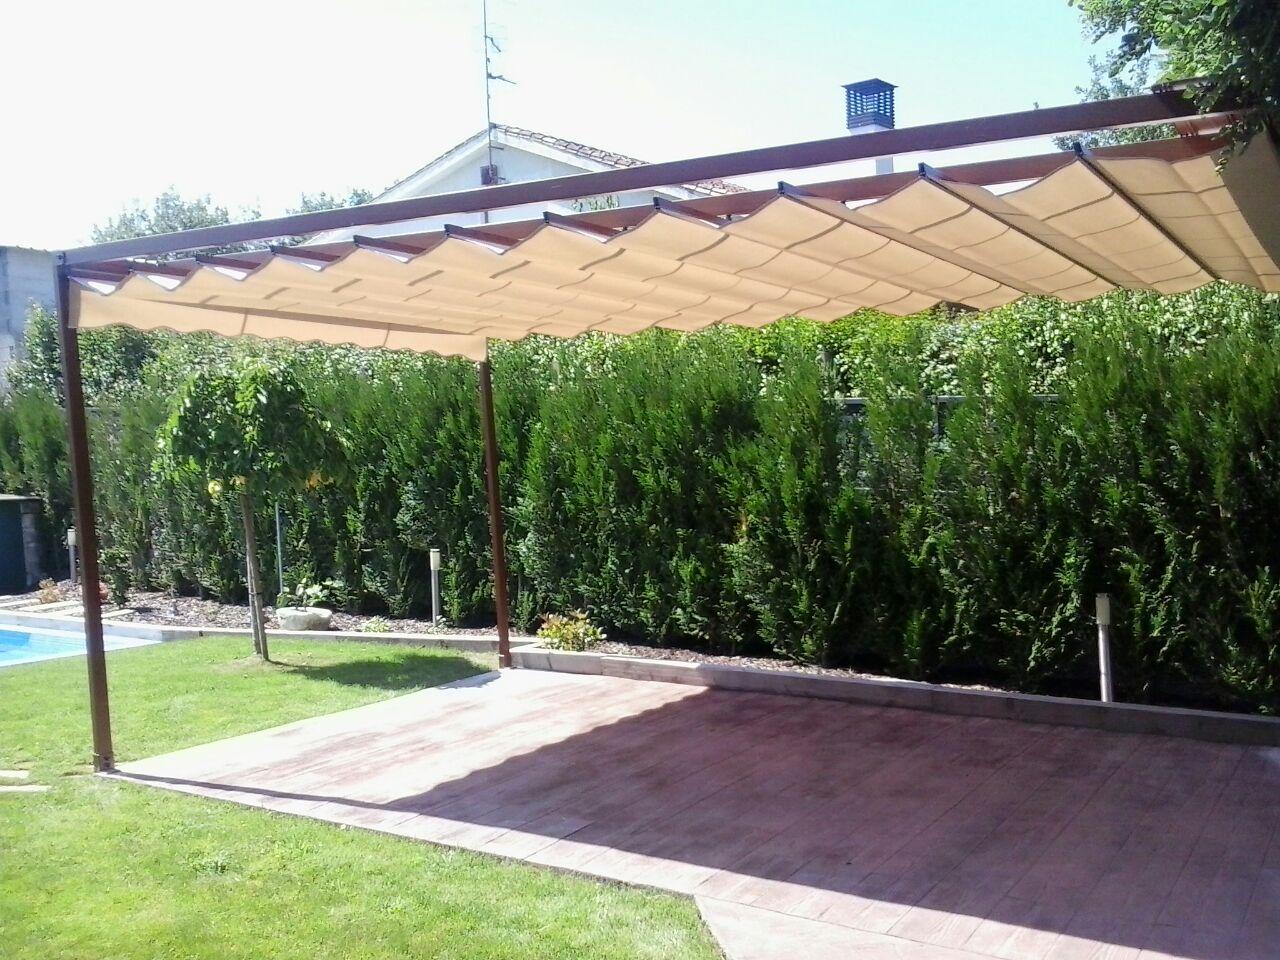 P rgola imitaci n madera a derrasa toldos informaci n for Toldos triangulares para terrazas